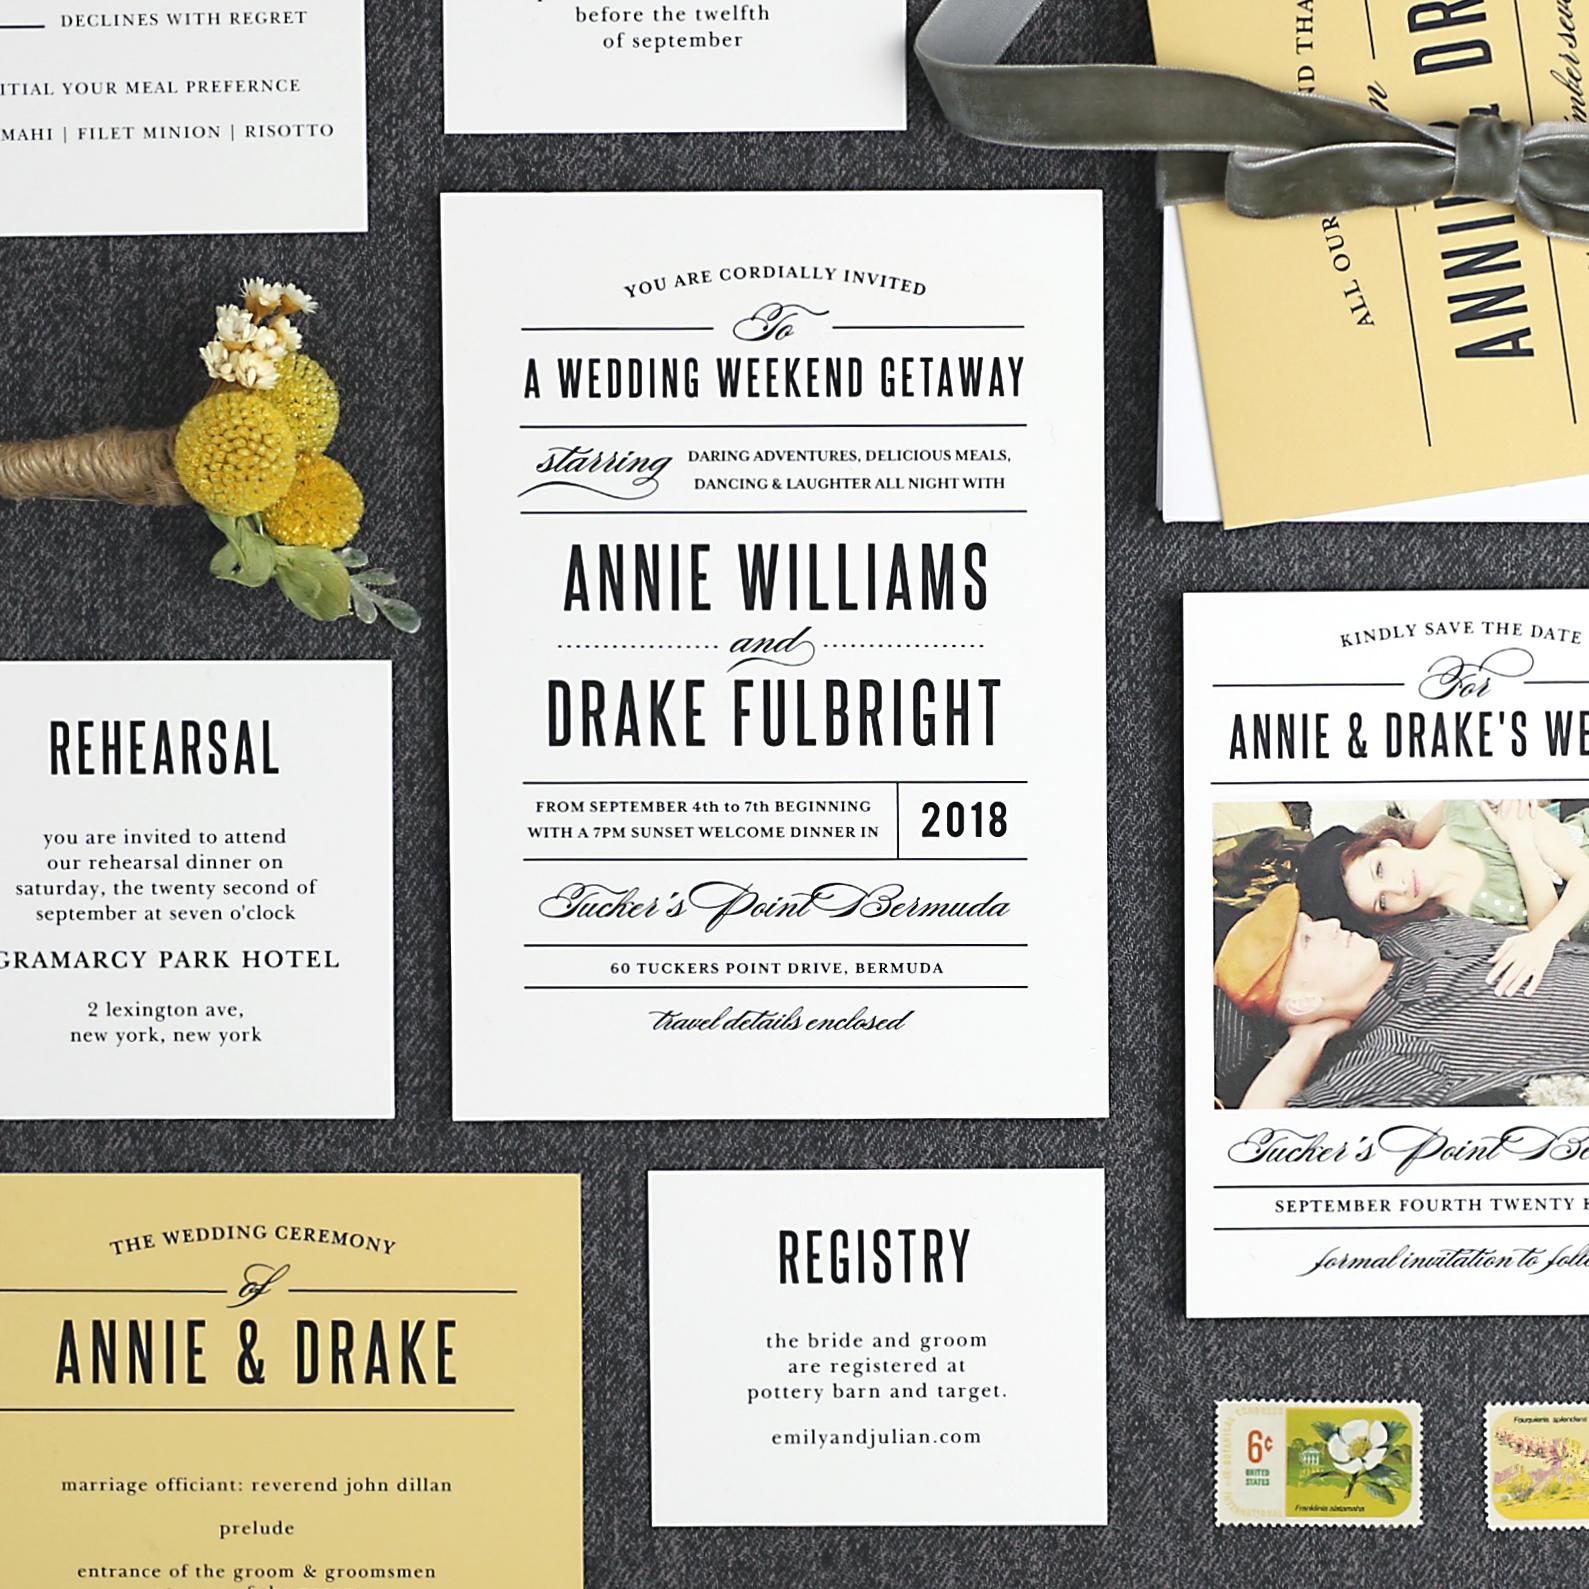 Wedding Invitation Picture Ideas: Denver Wedding Photographers